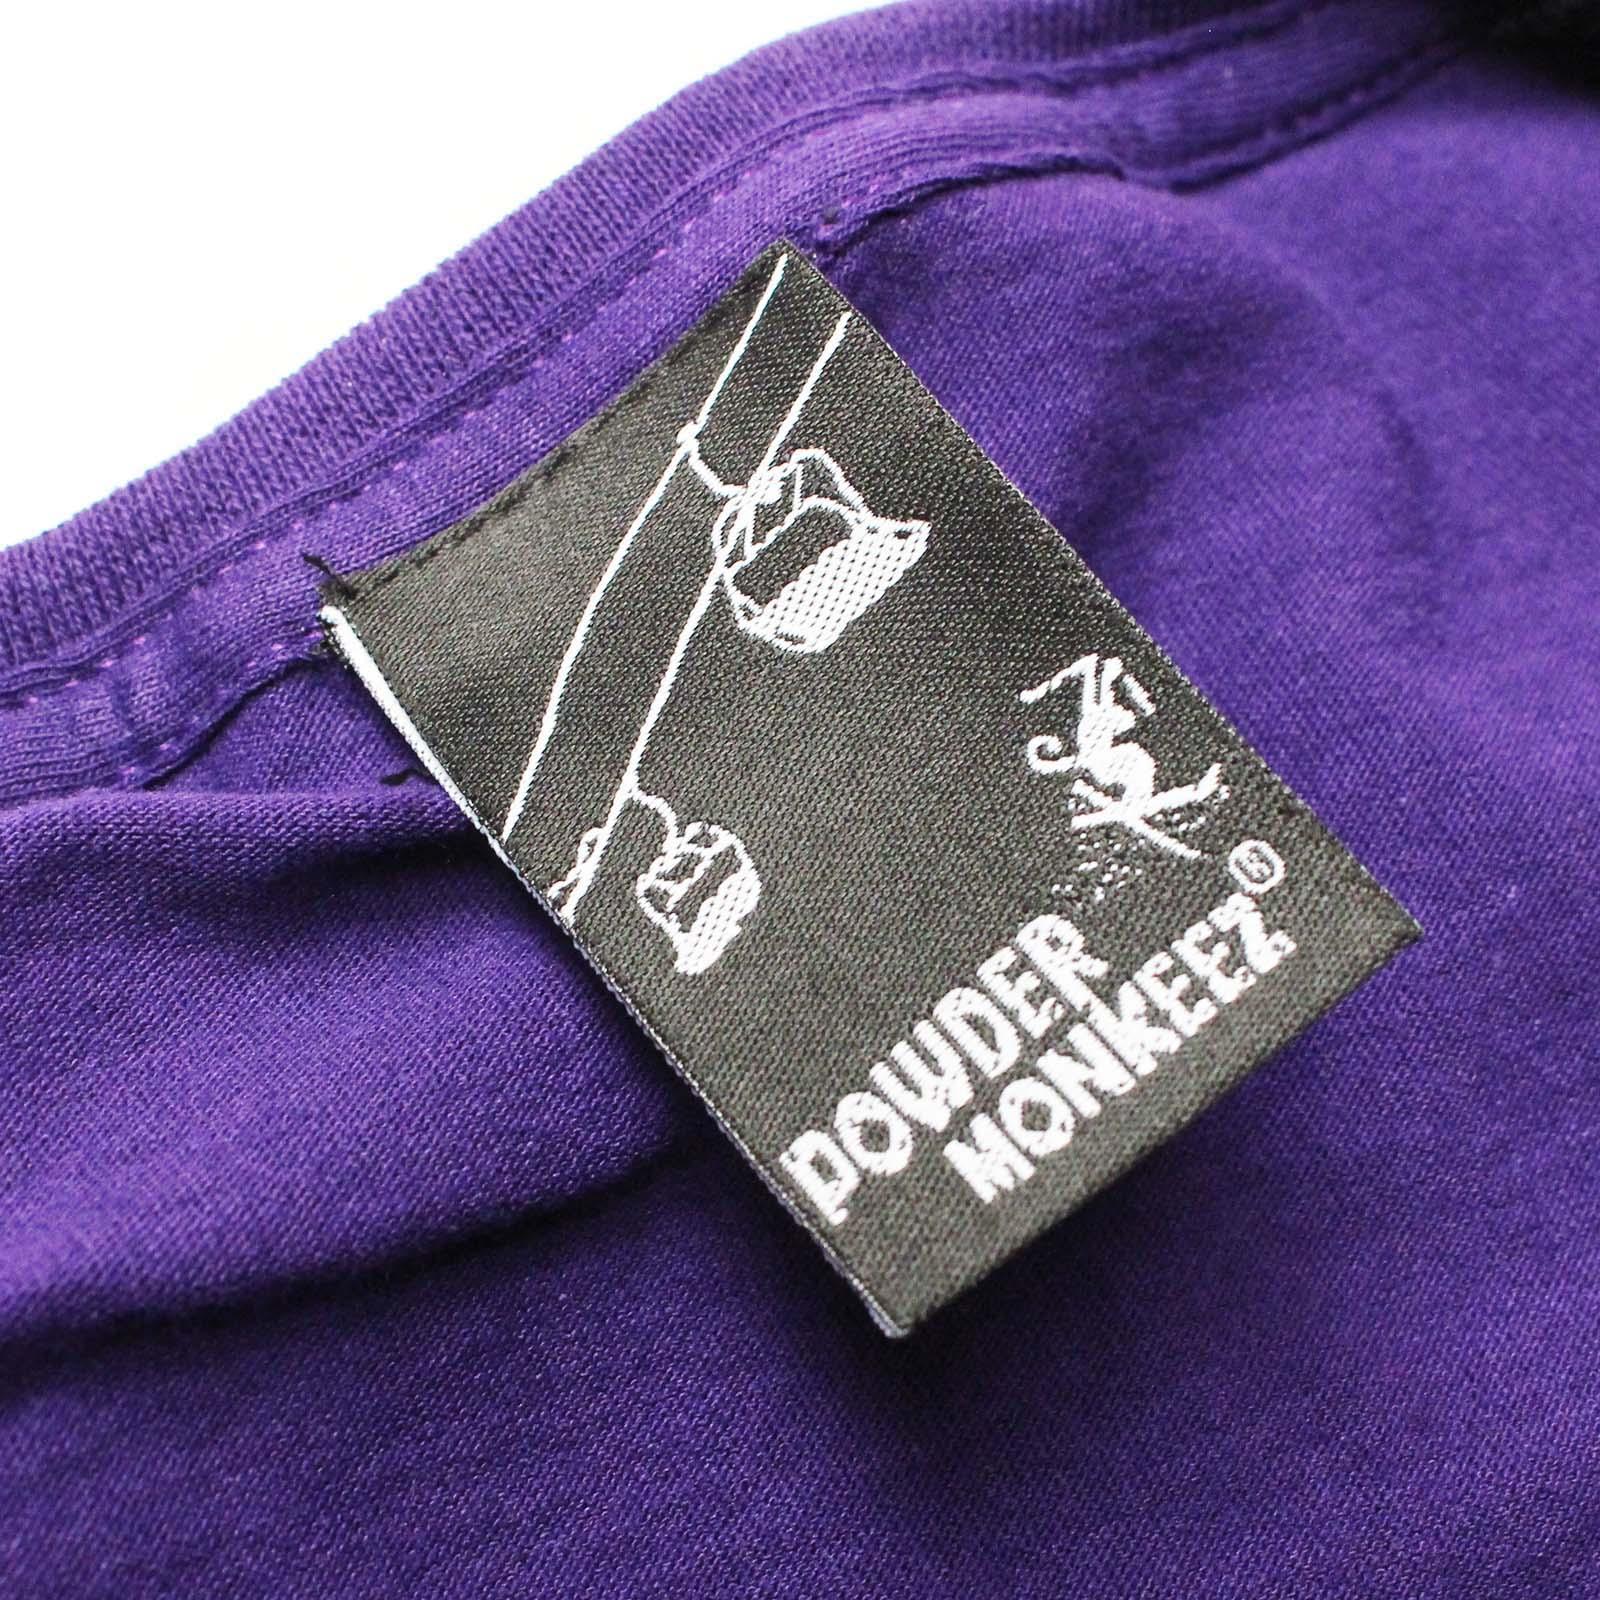 Skiing-Ski-Tops-T-Shirt-Funny-Novelty-Womens-tee-Ski-I-Ski-Like-A-Gir thumbnail 20